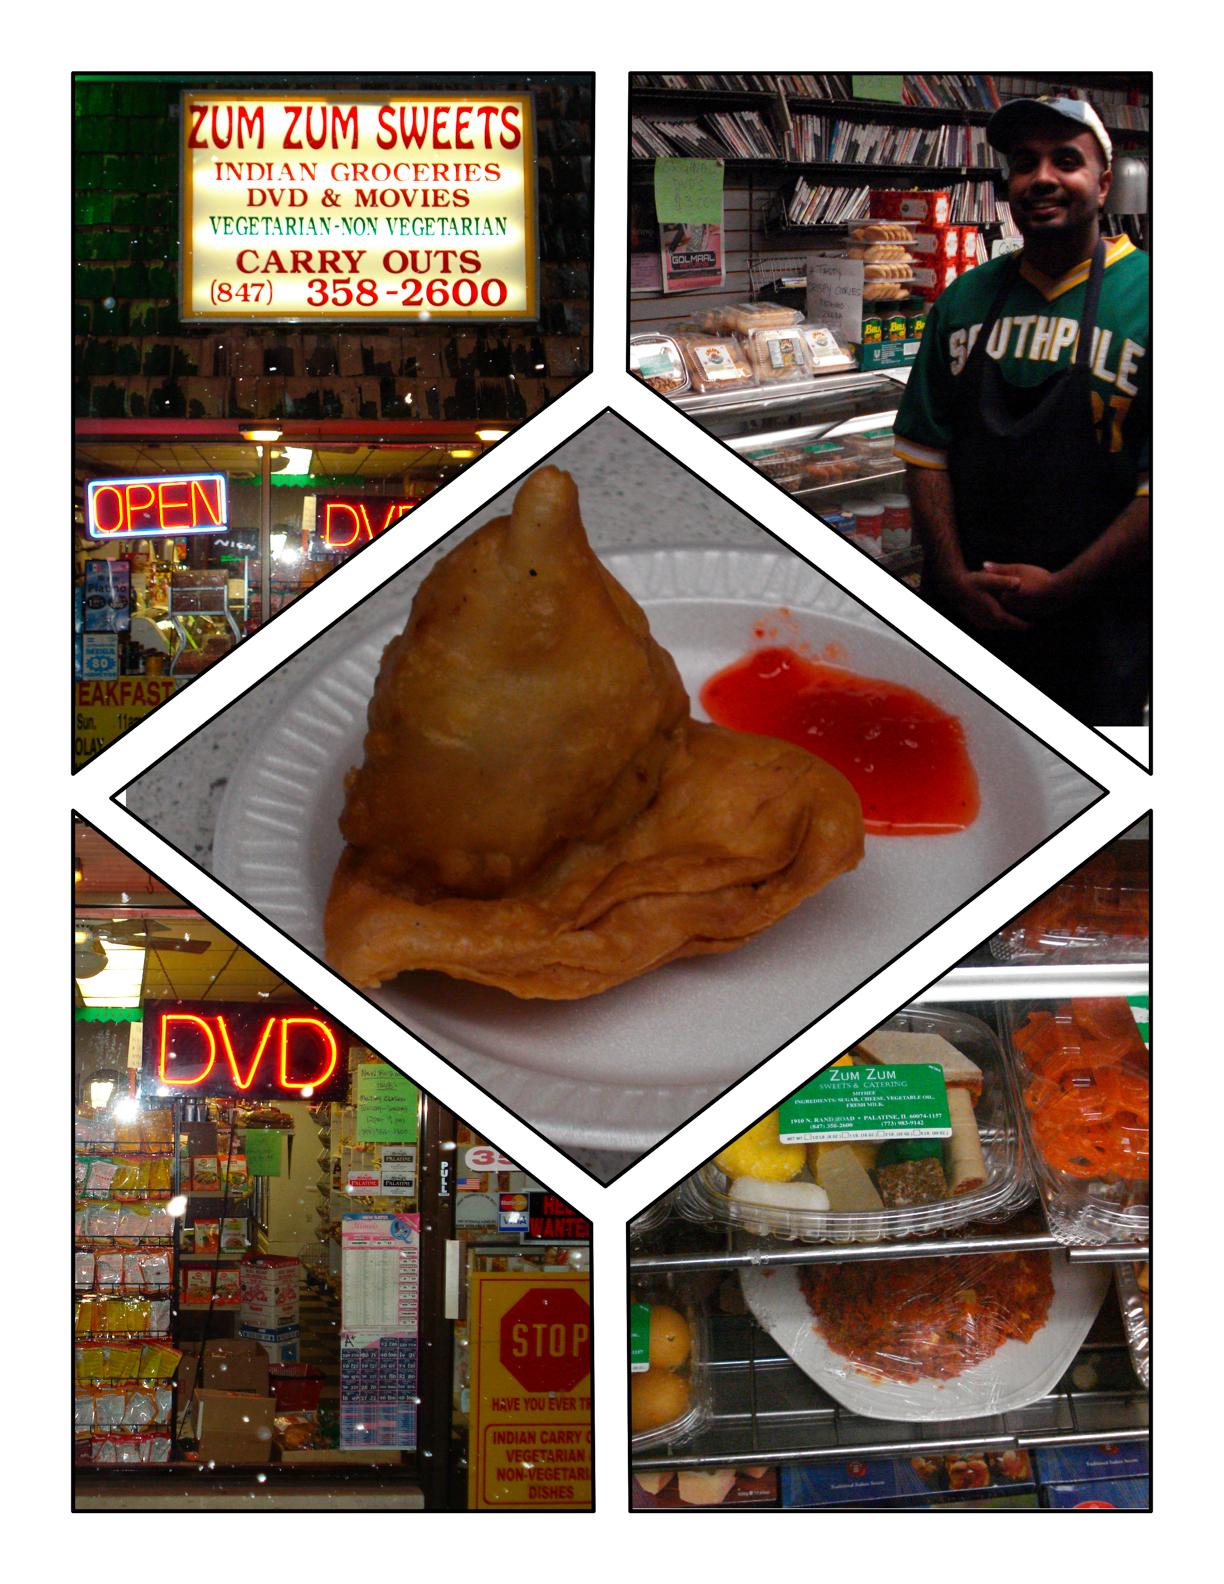 Hakeem Aslam at Zum Zum Sweets on Rand Road in Palatine served a samosa. It was good. Photo by Christopher Brinckerhoff.